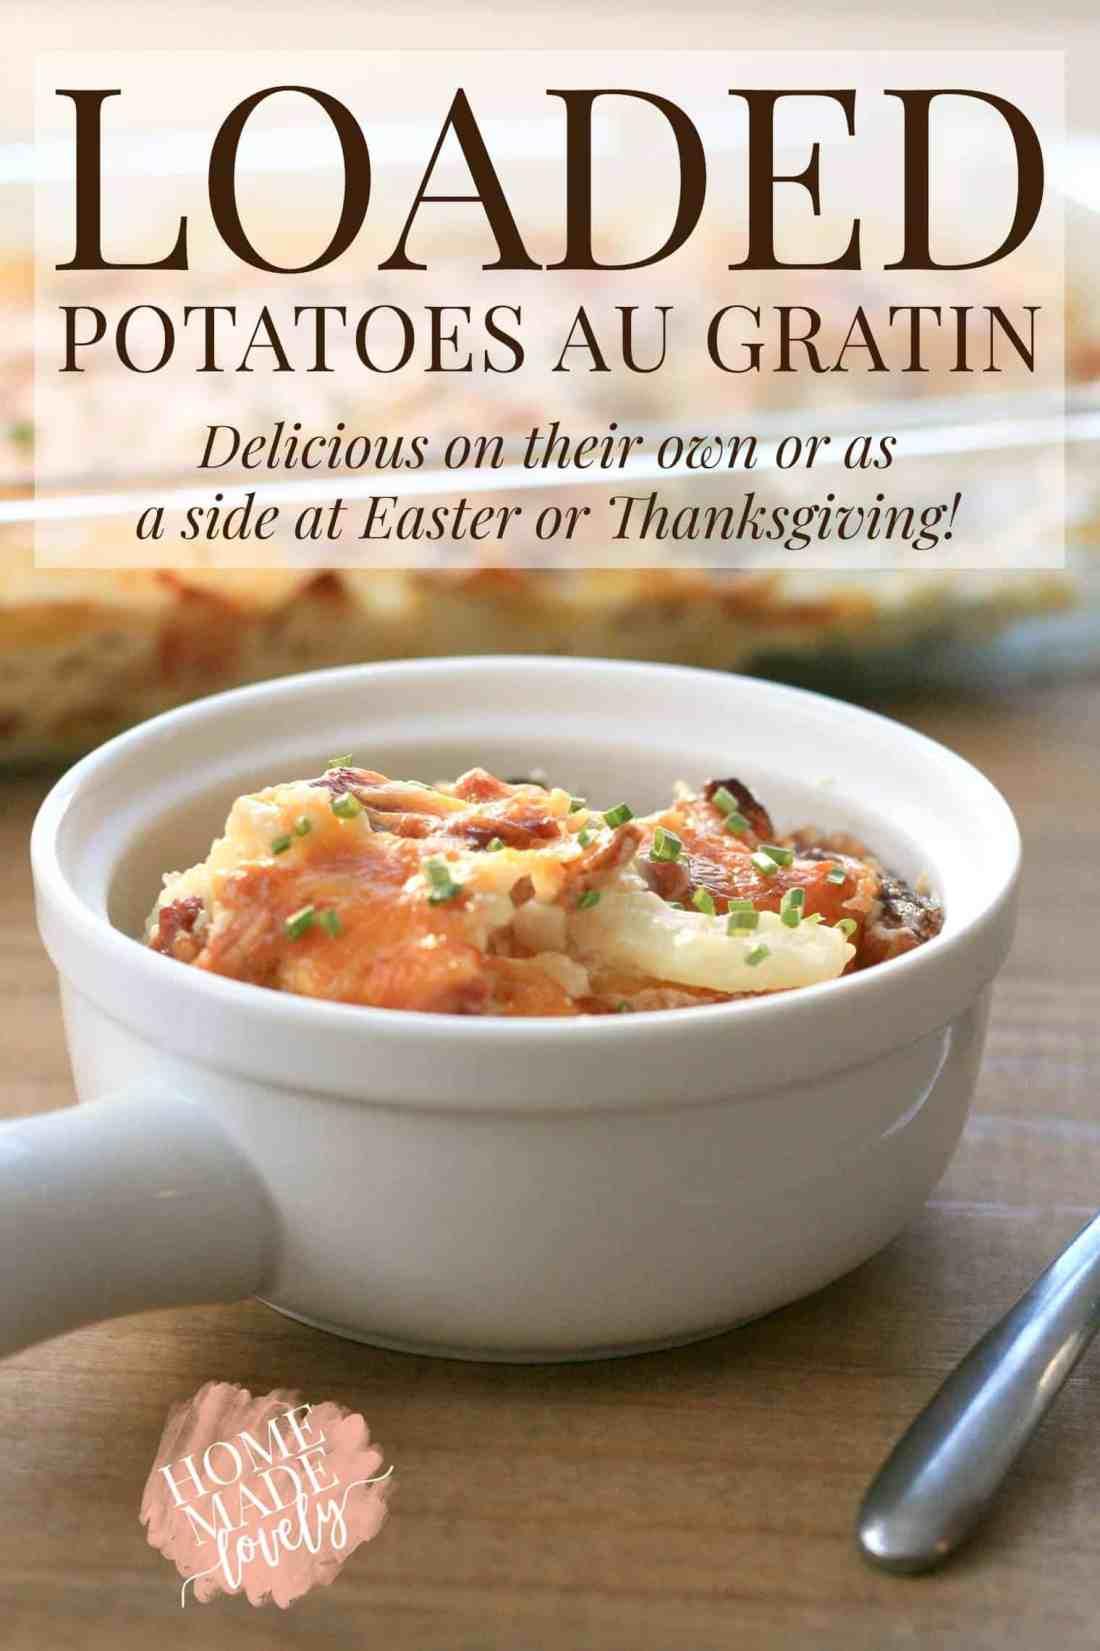 loaded potatoes au gratin in a bowl